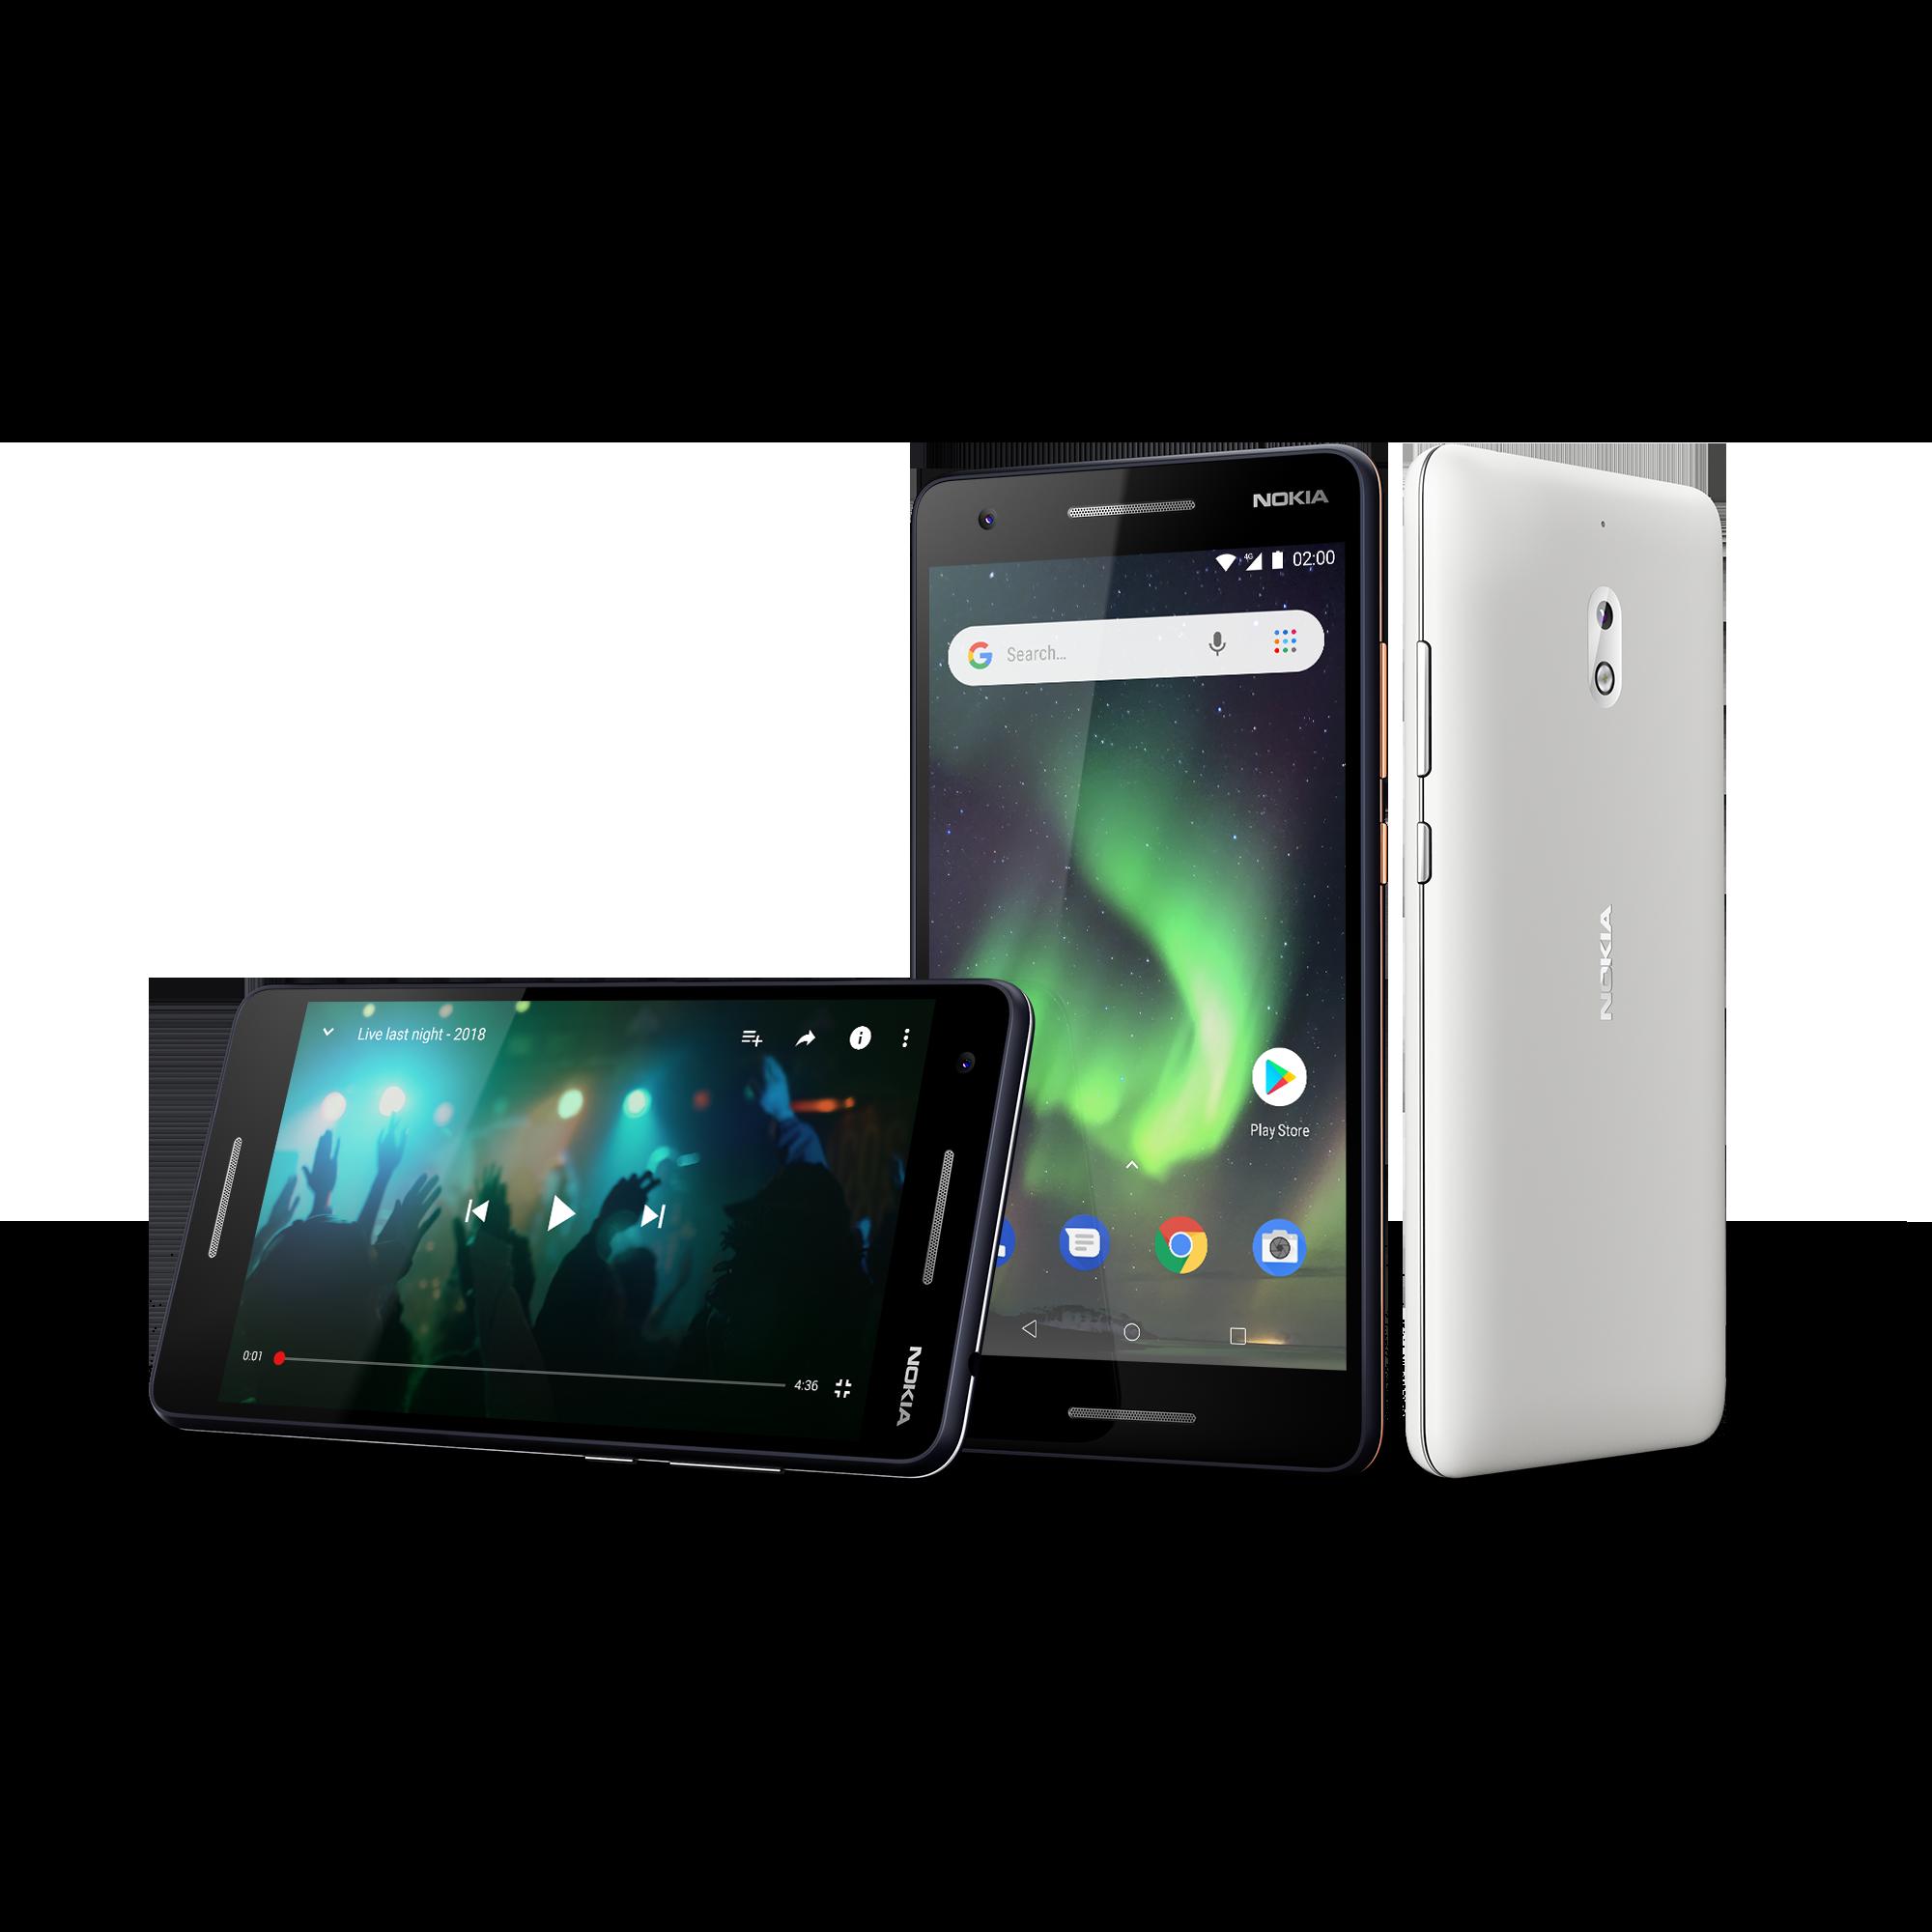 Nokia 2.1 image for representation purposes